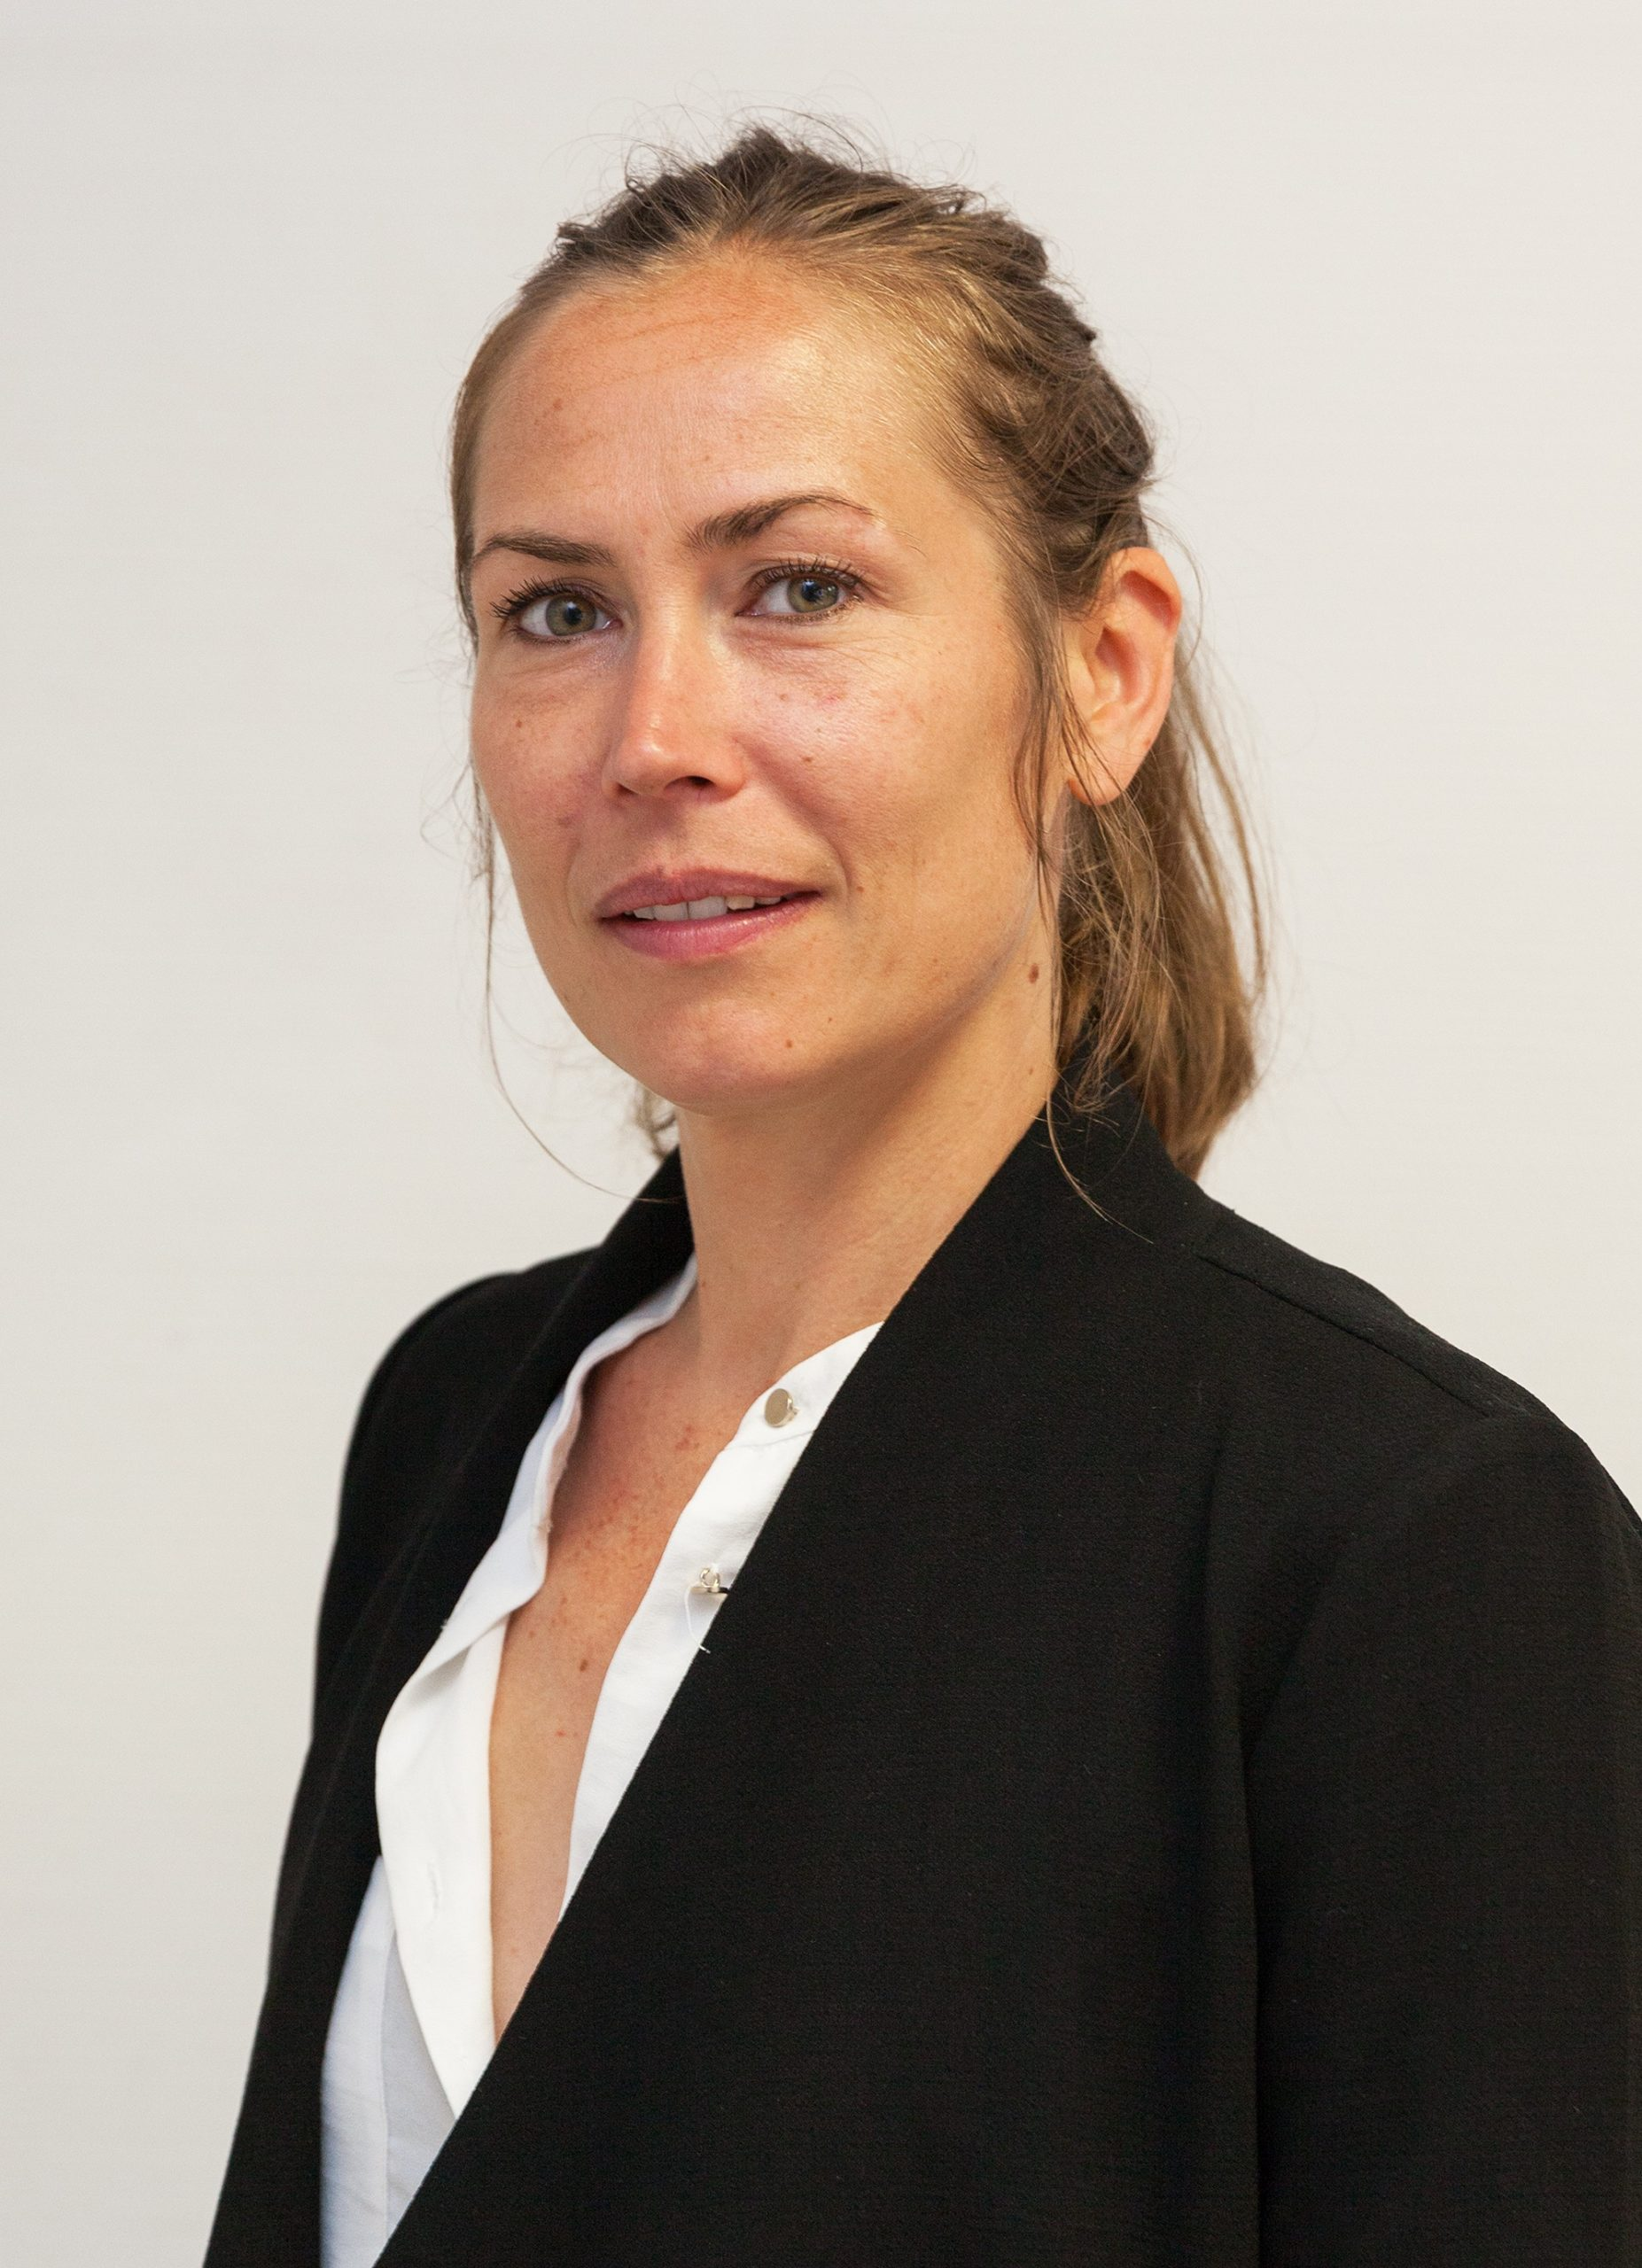 Johanna Walkowiak